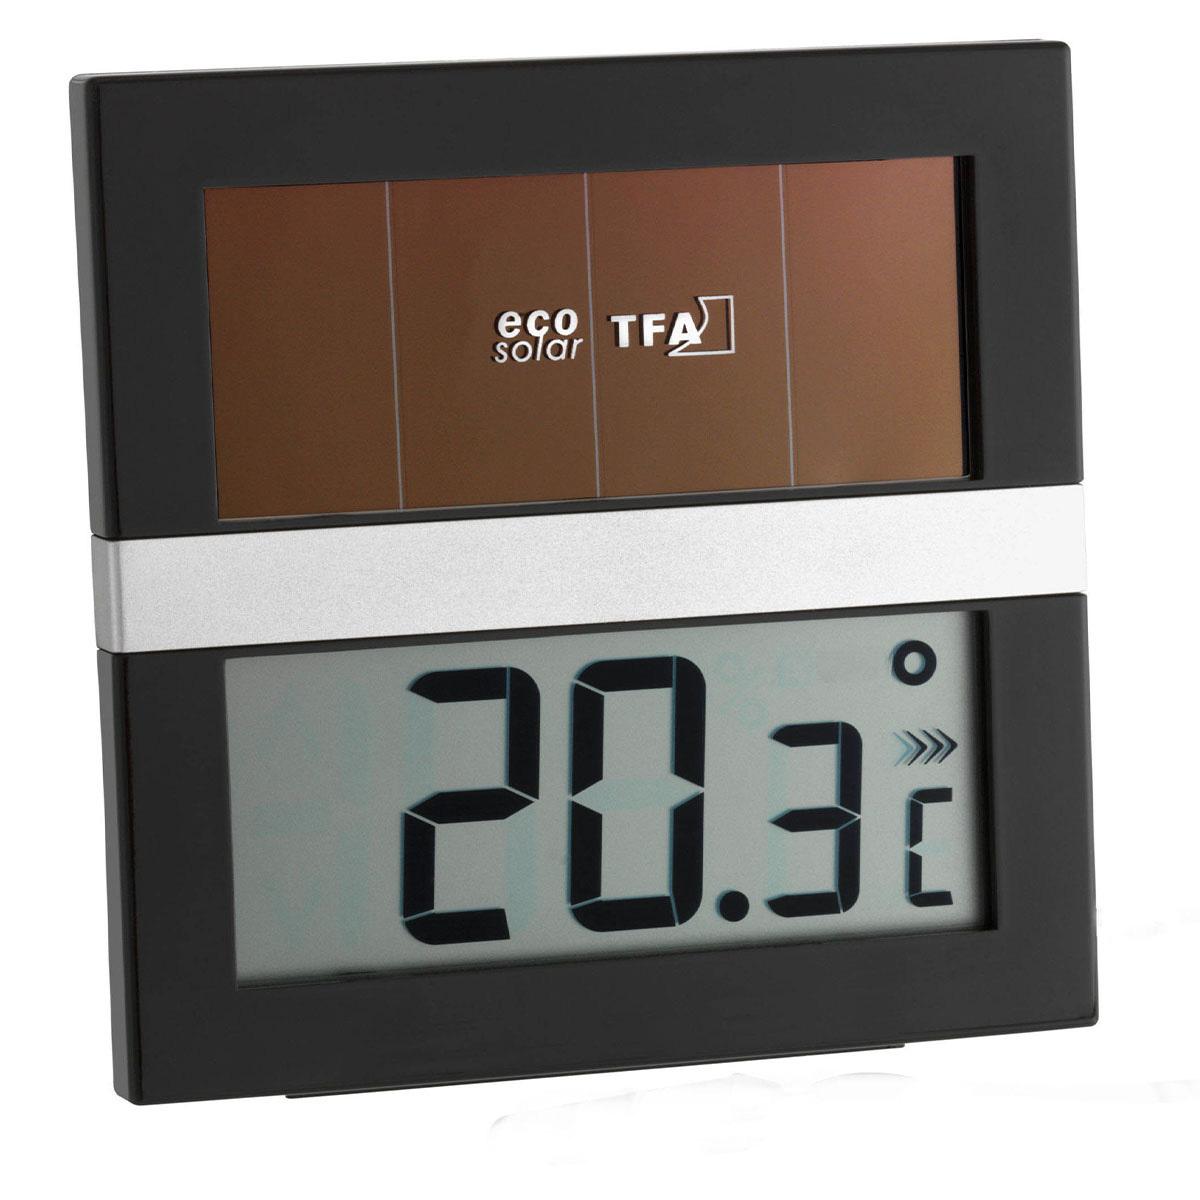 30-1037-digitales-solar-thermometer-eco-solar-1200x1200px.jpg